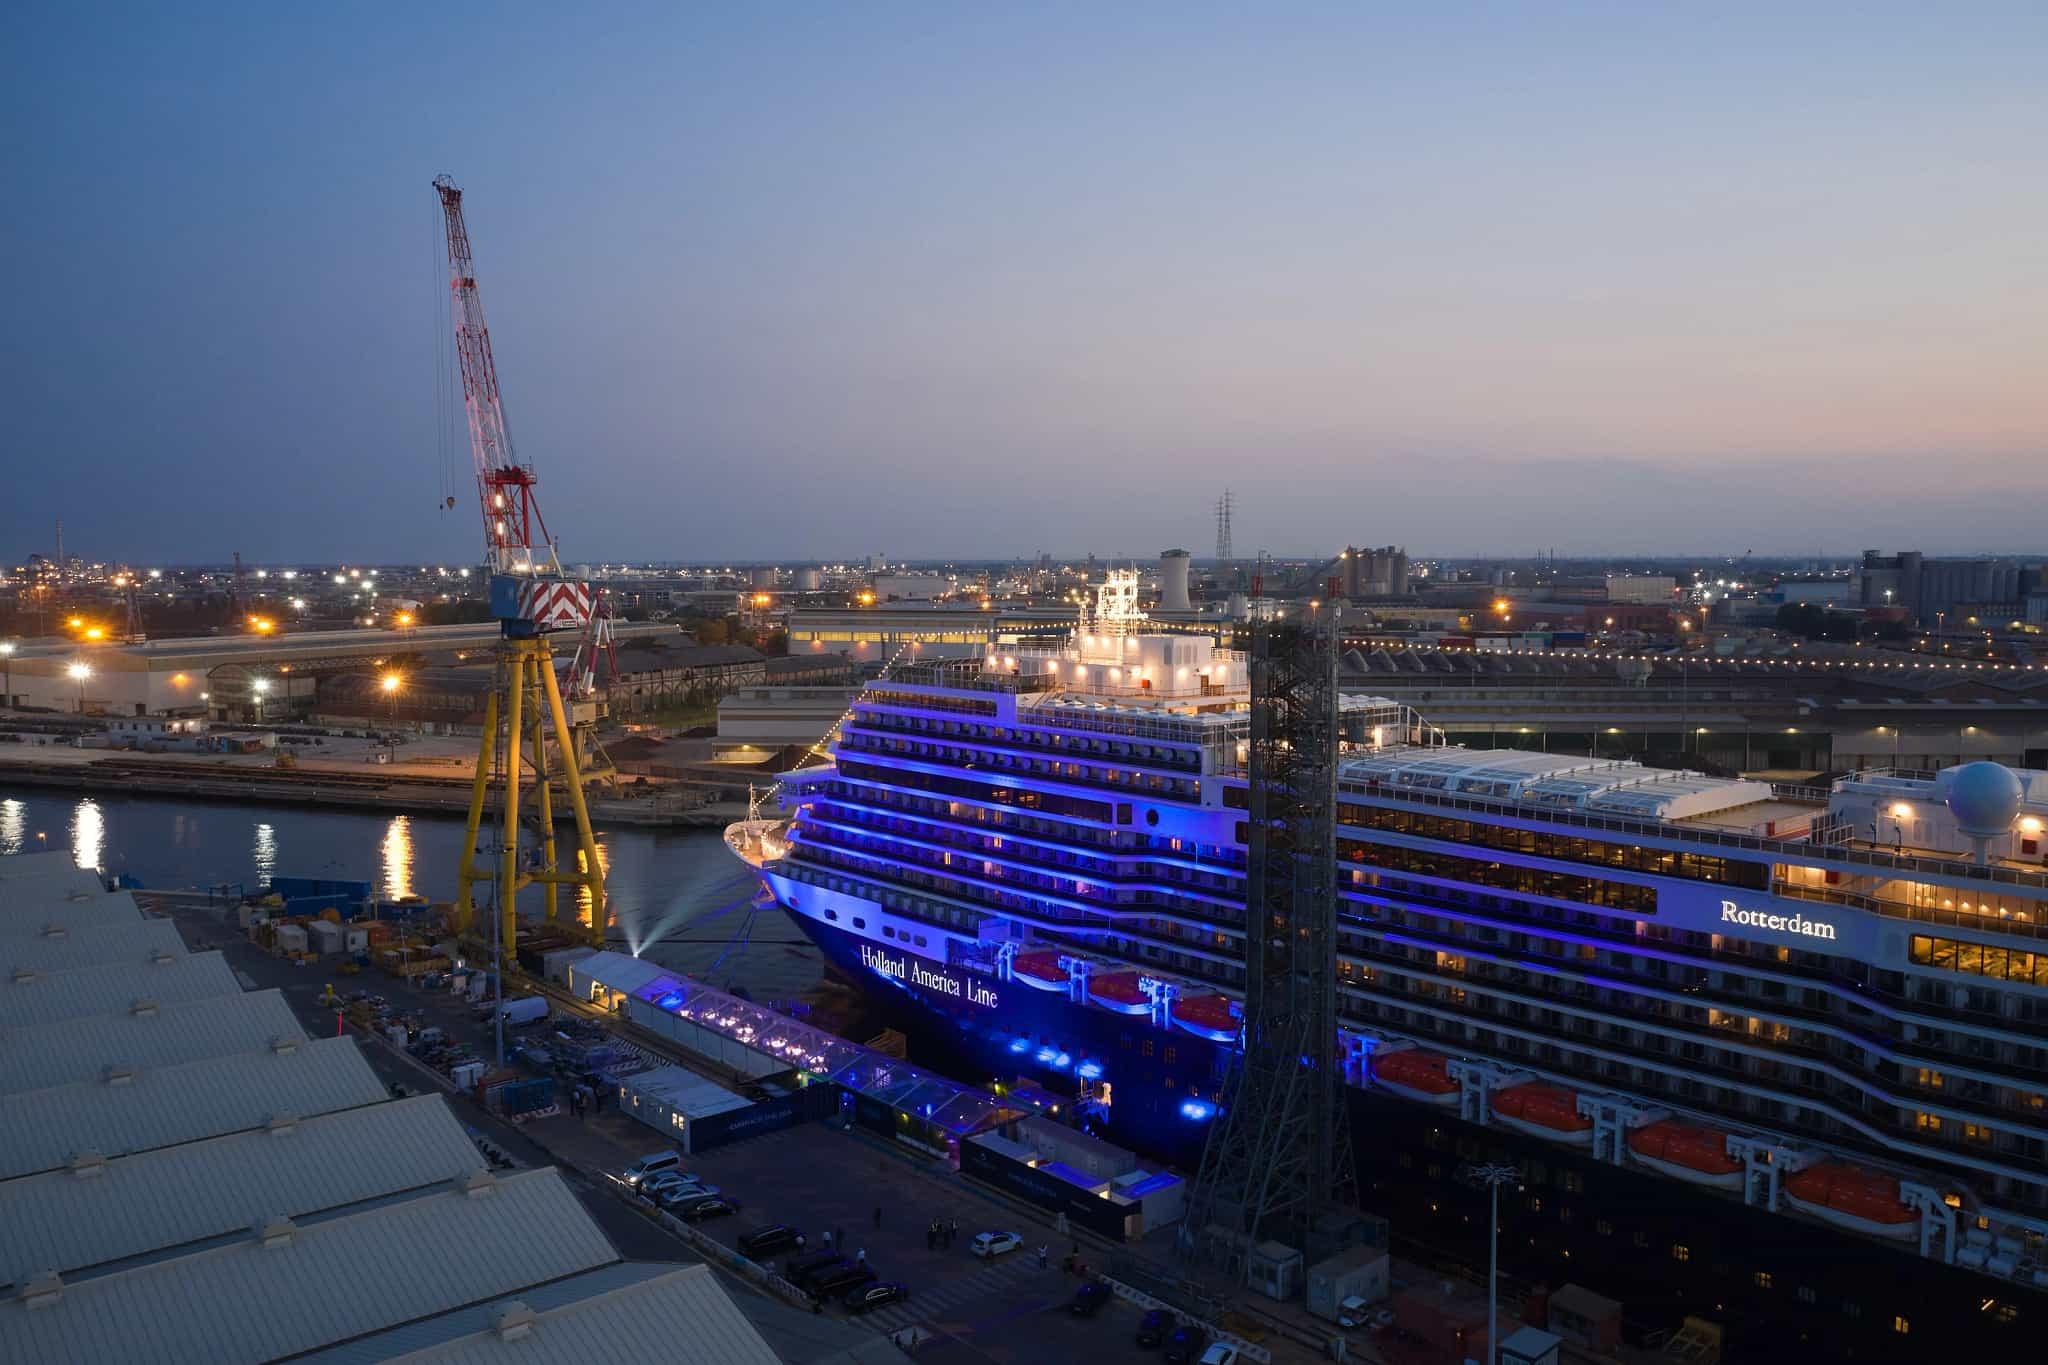 holland america rotterdam fincantieri shipyard italy